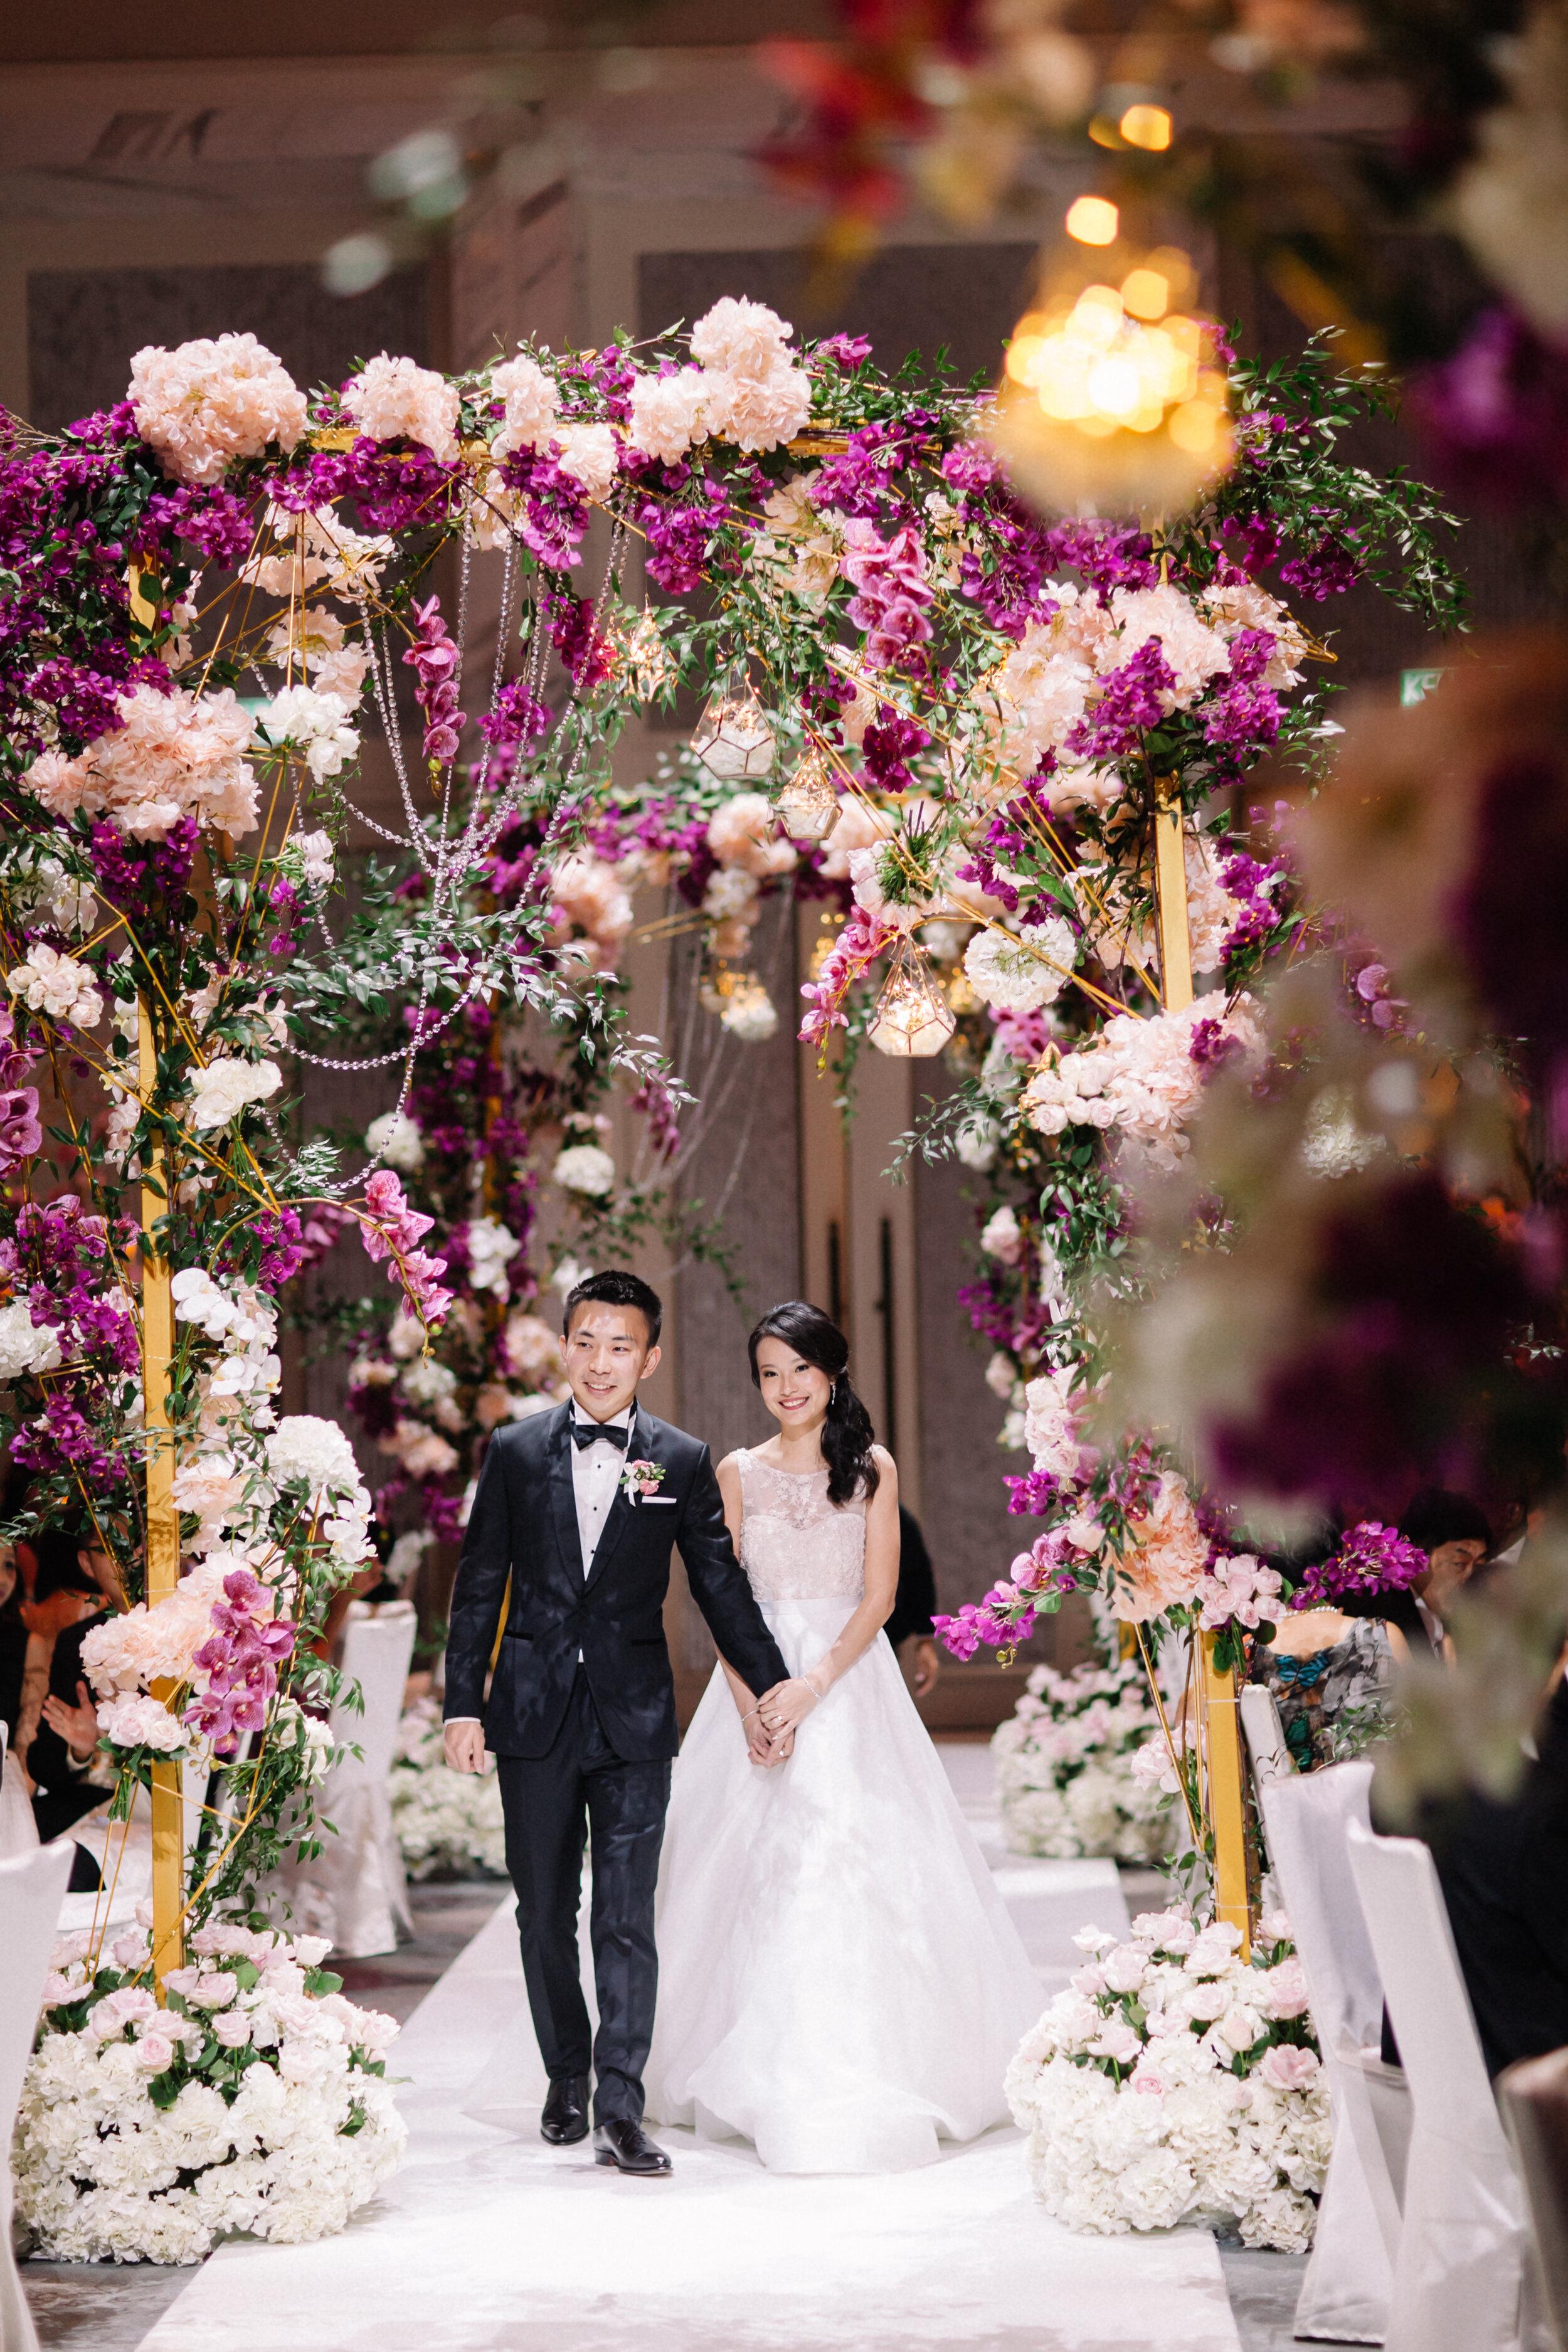 JIAMING & WHEY JINN - Hotel Grand Wedding at St. Regis Kuala Lumpur